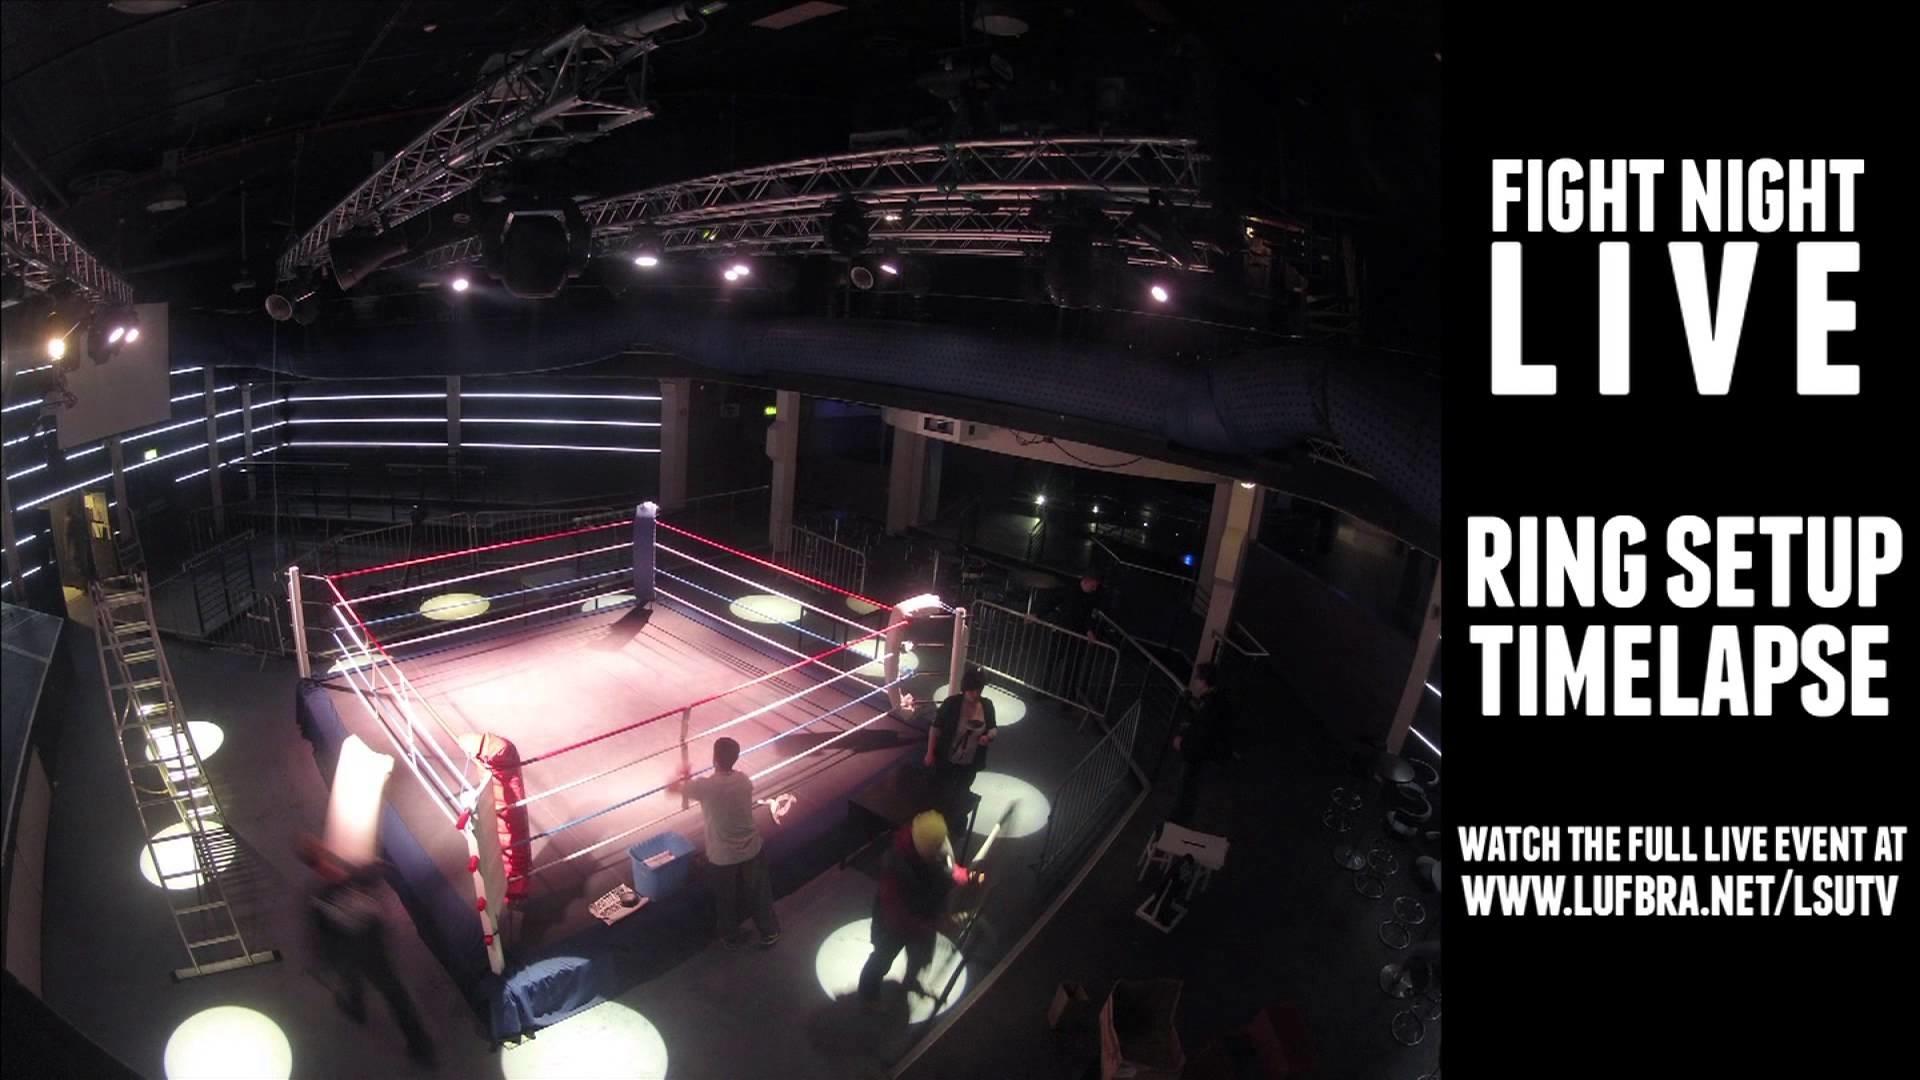 Kickboxing Ring Setup Time Lapse